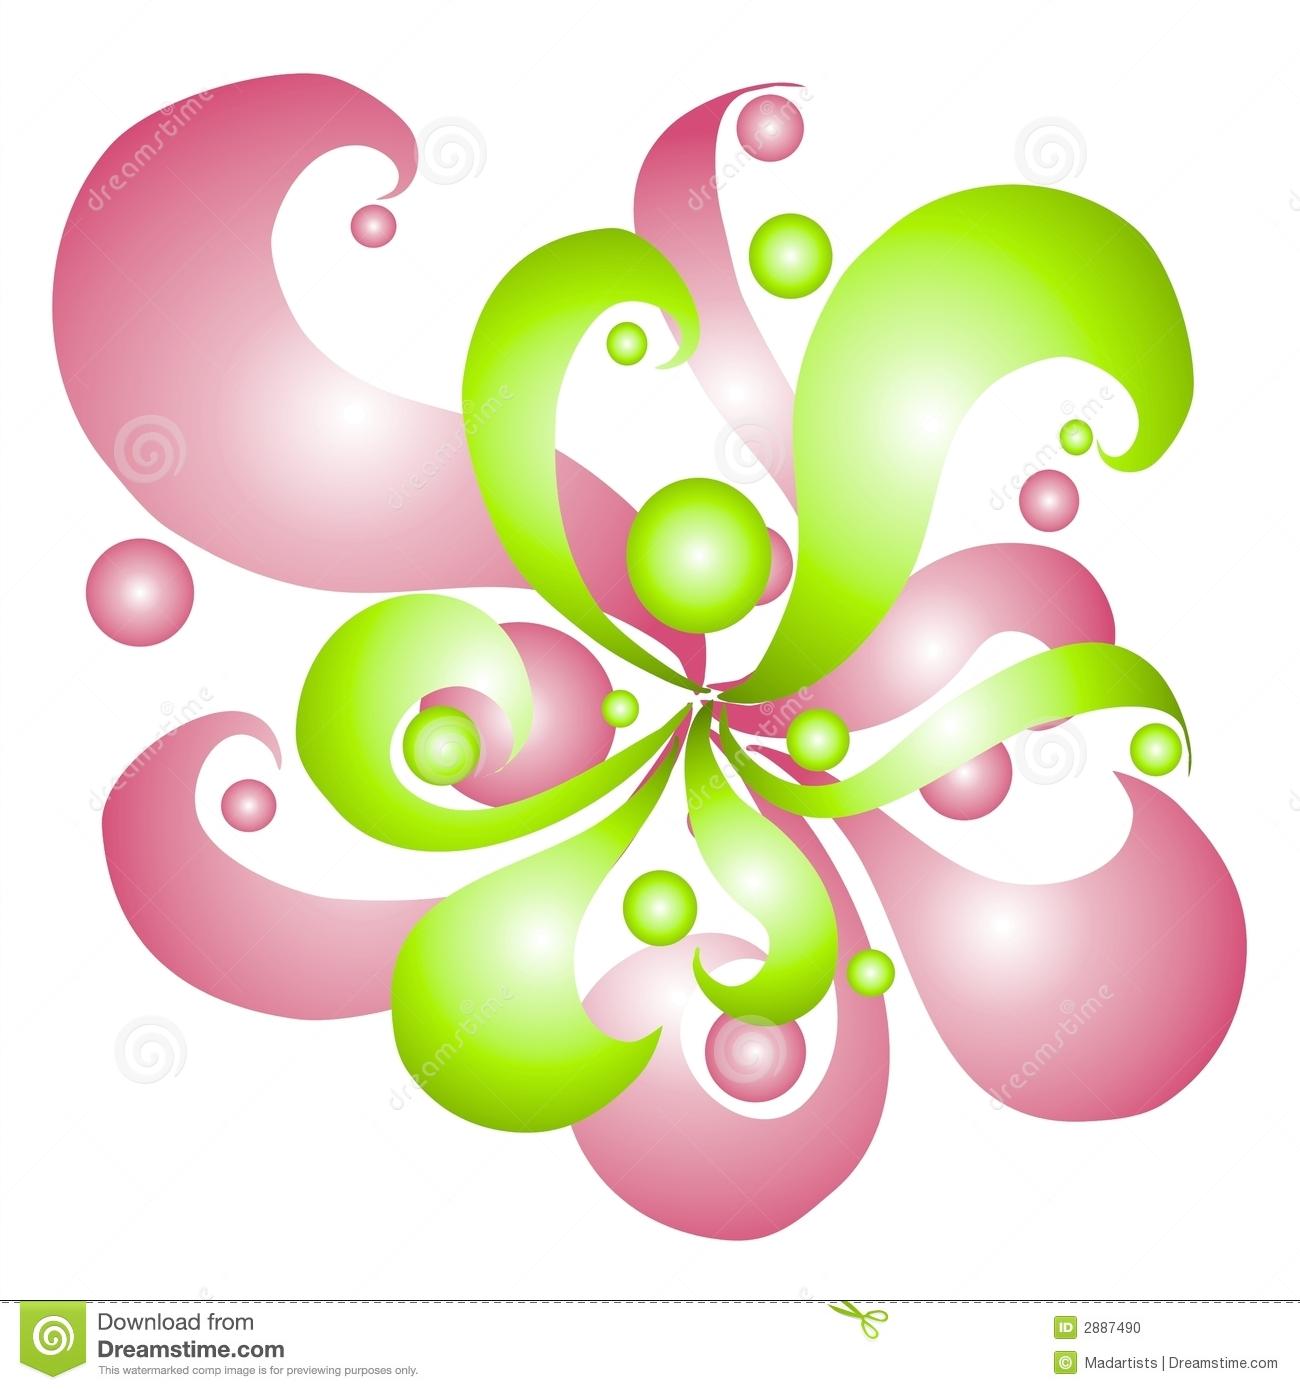 Swirls Image.